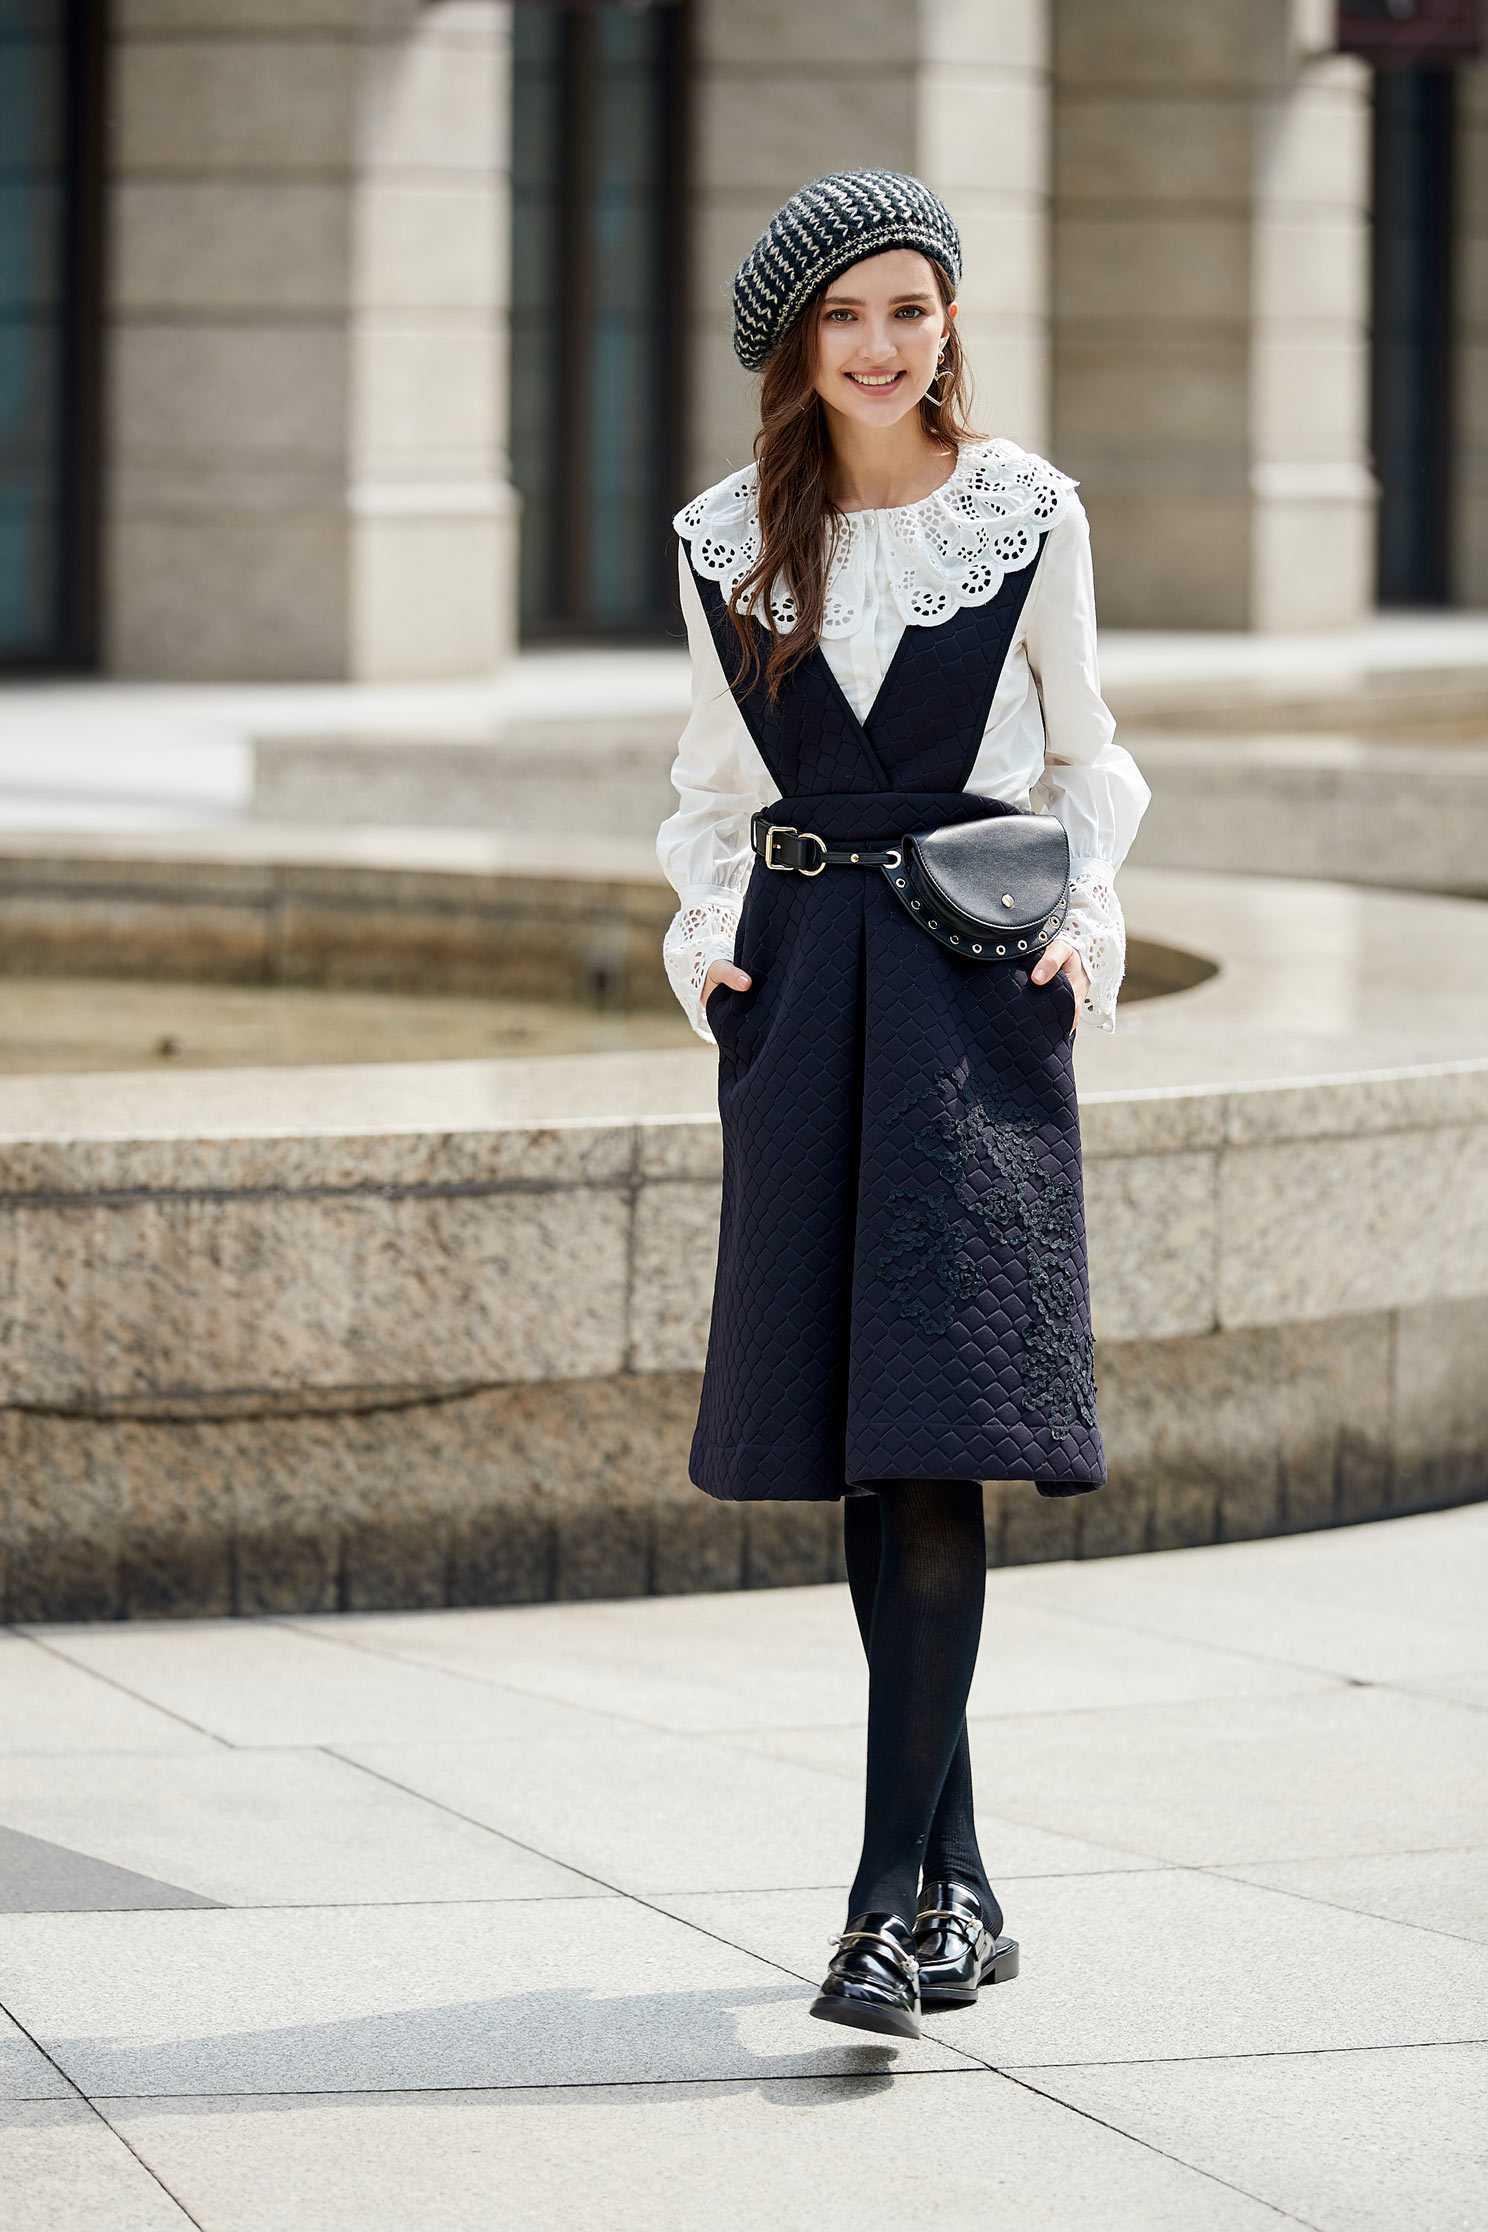 Classical elegant design top,Top,白色上衣,Cotton,Blouse,長袖上衣